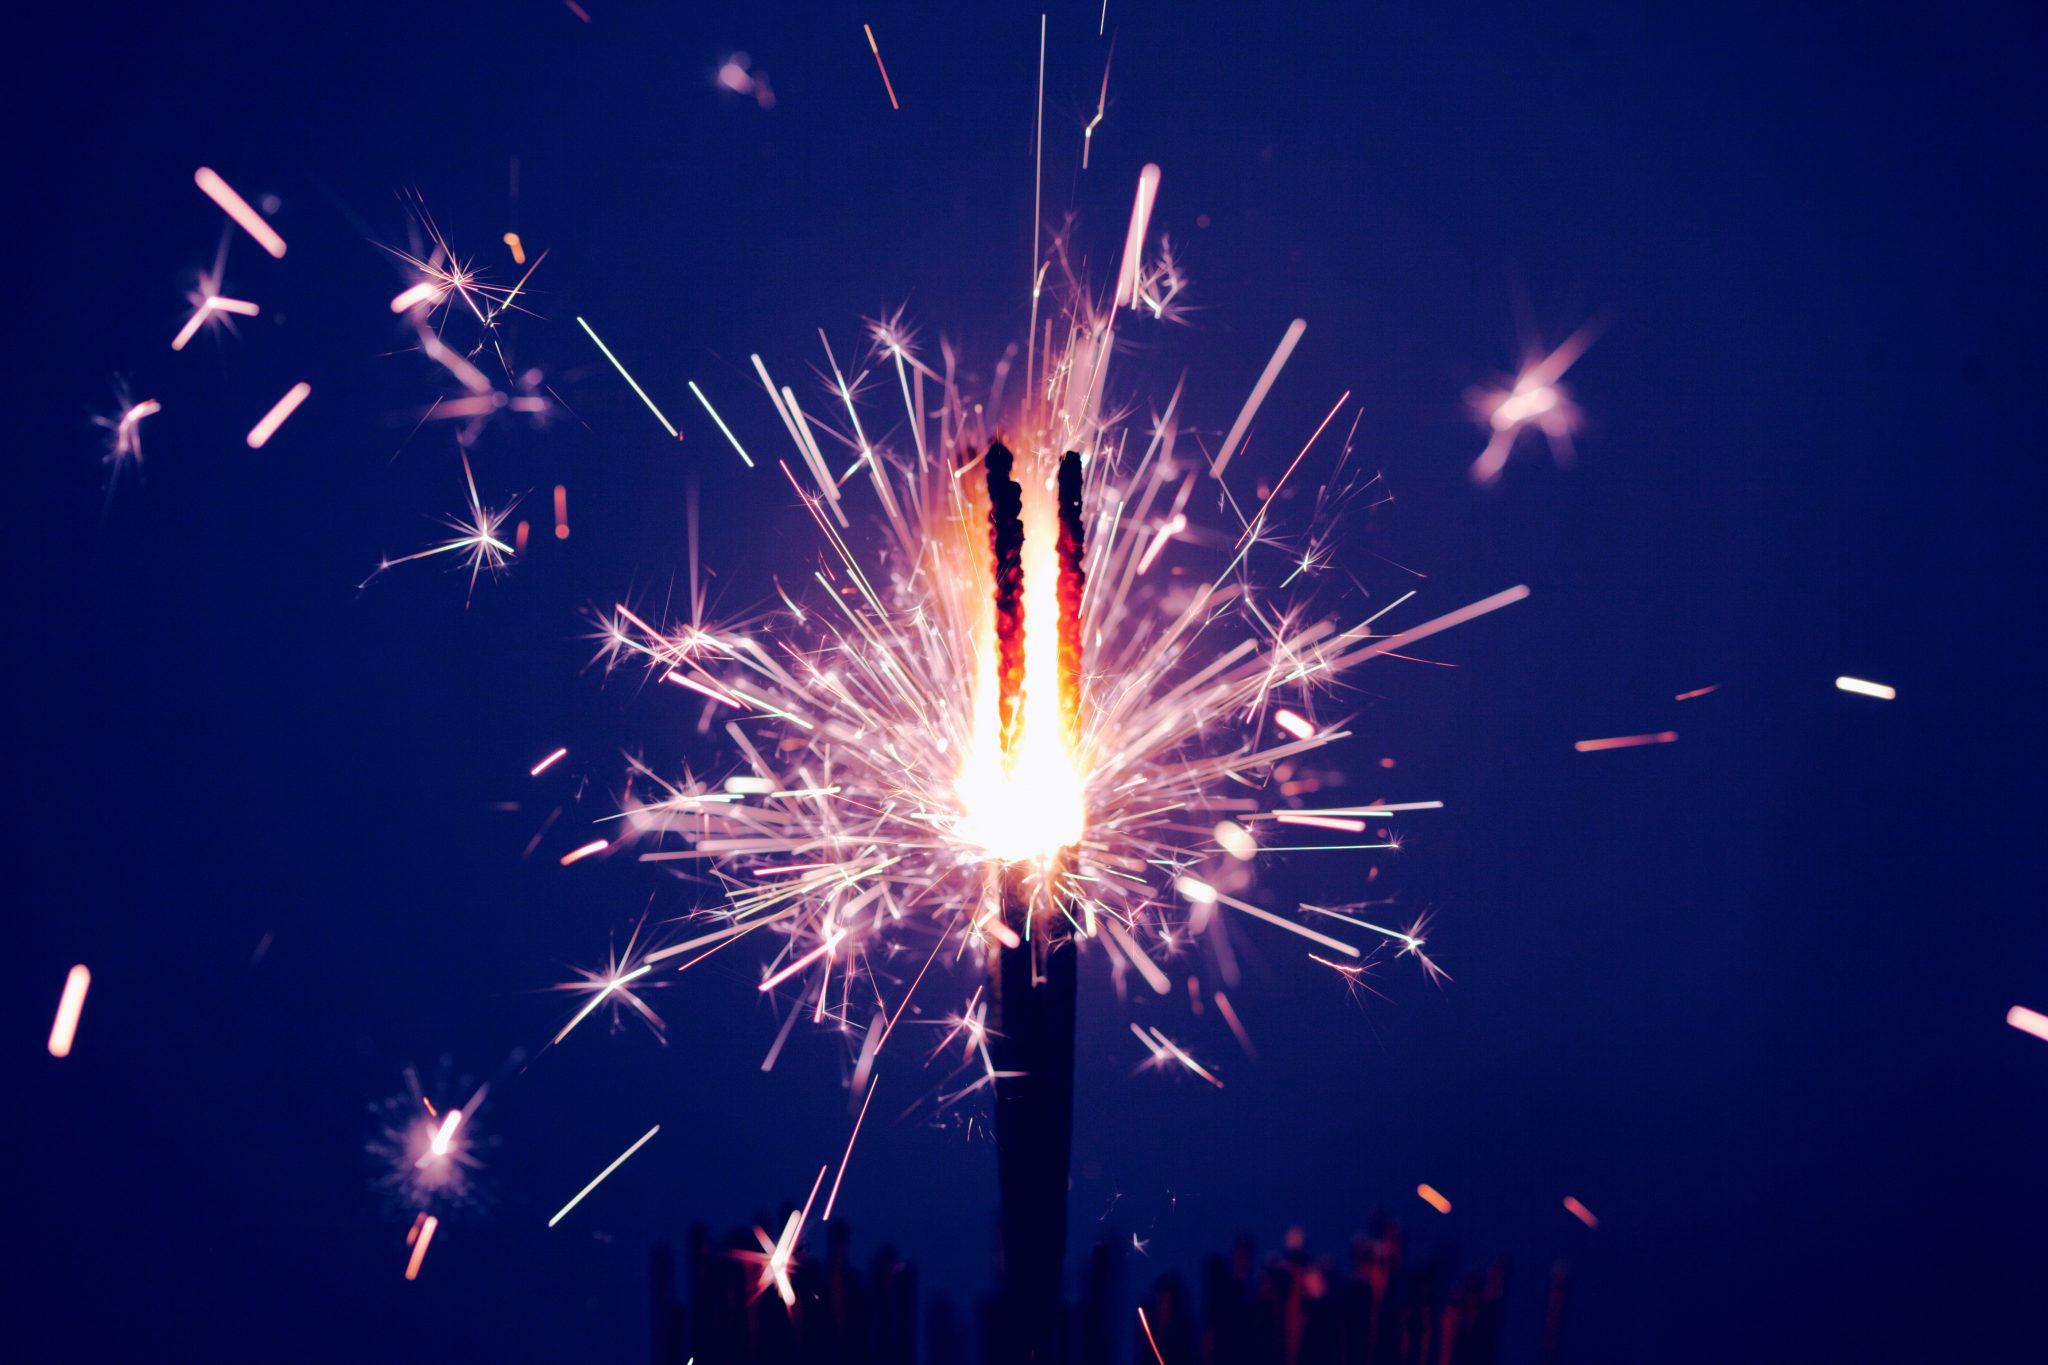 Photo of sparkling firework by sharon mccutcheon on unsplash